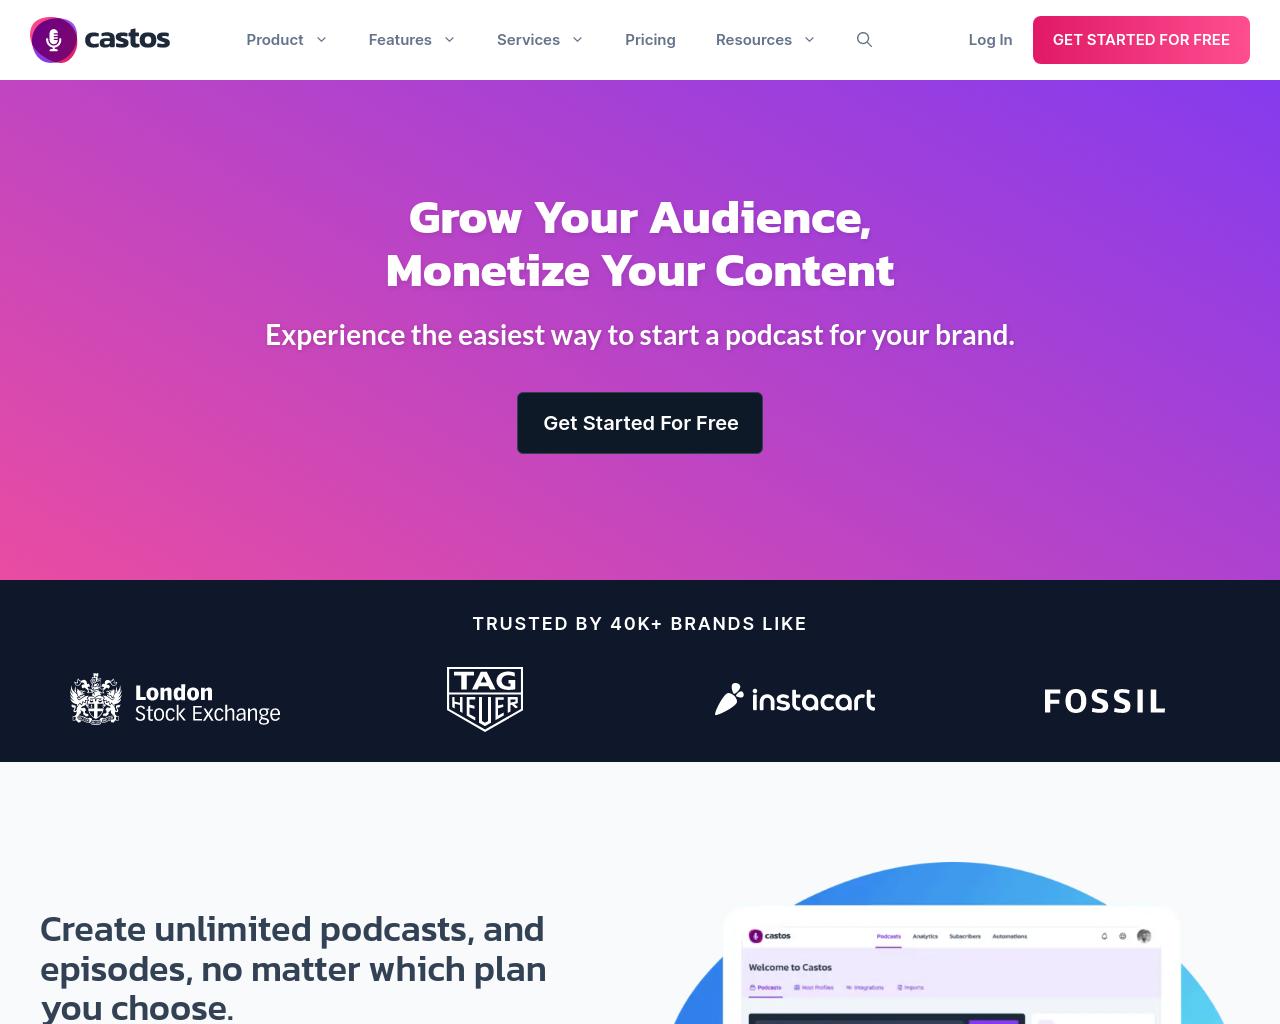 Castos homepage